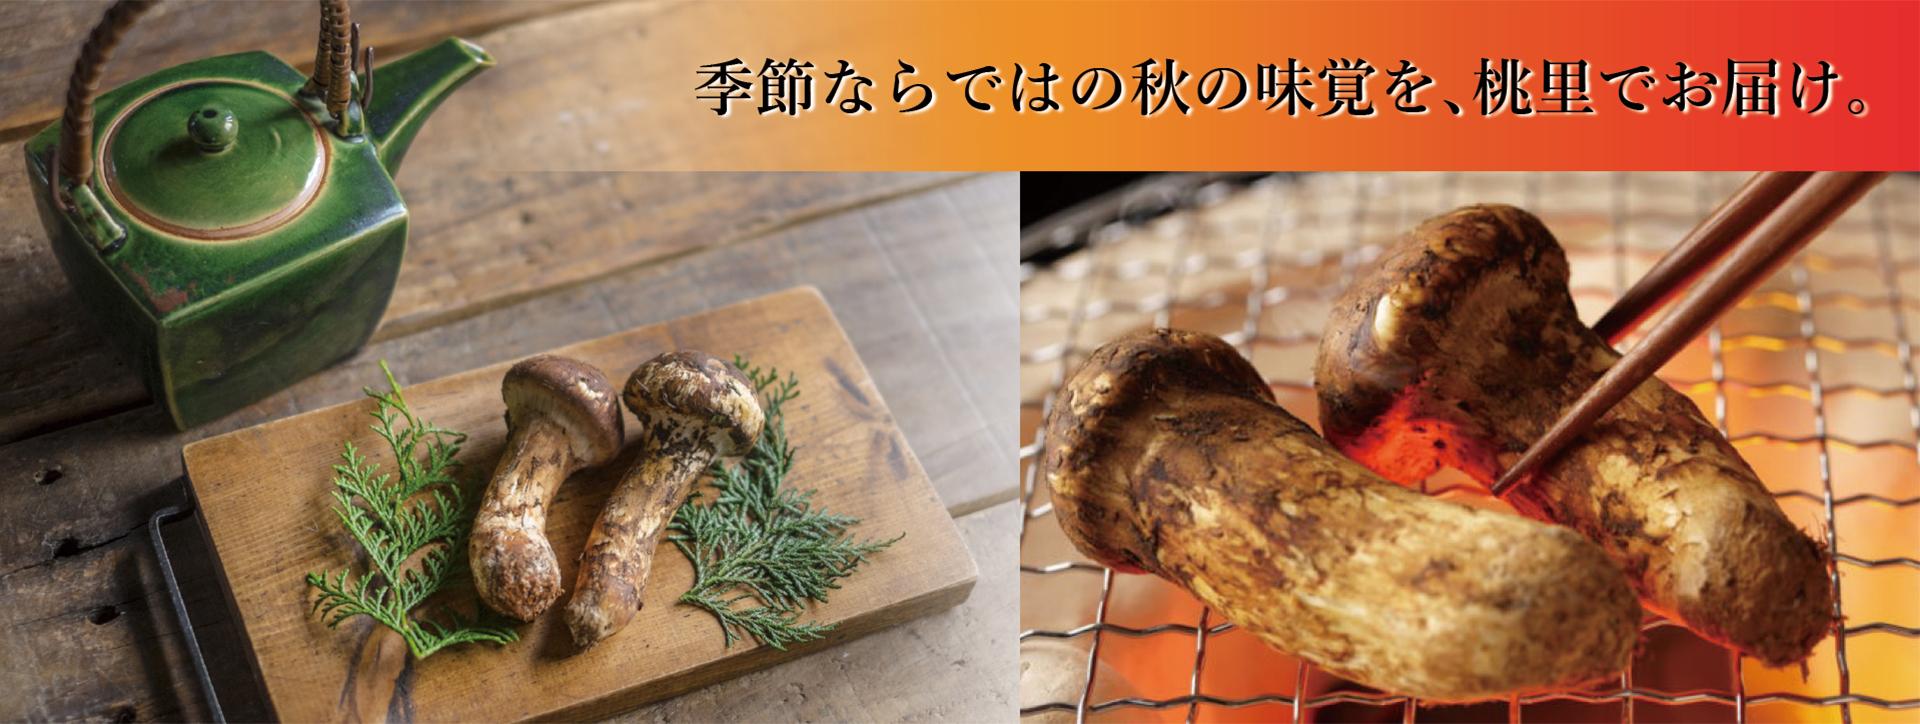 top-image_matsutake